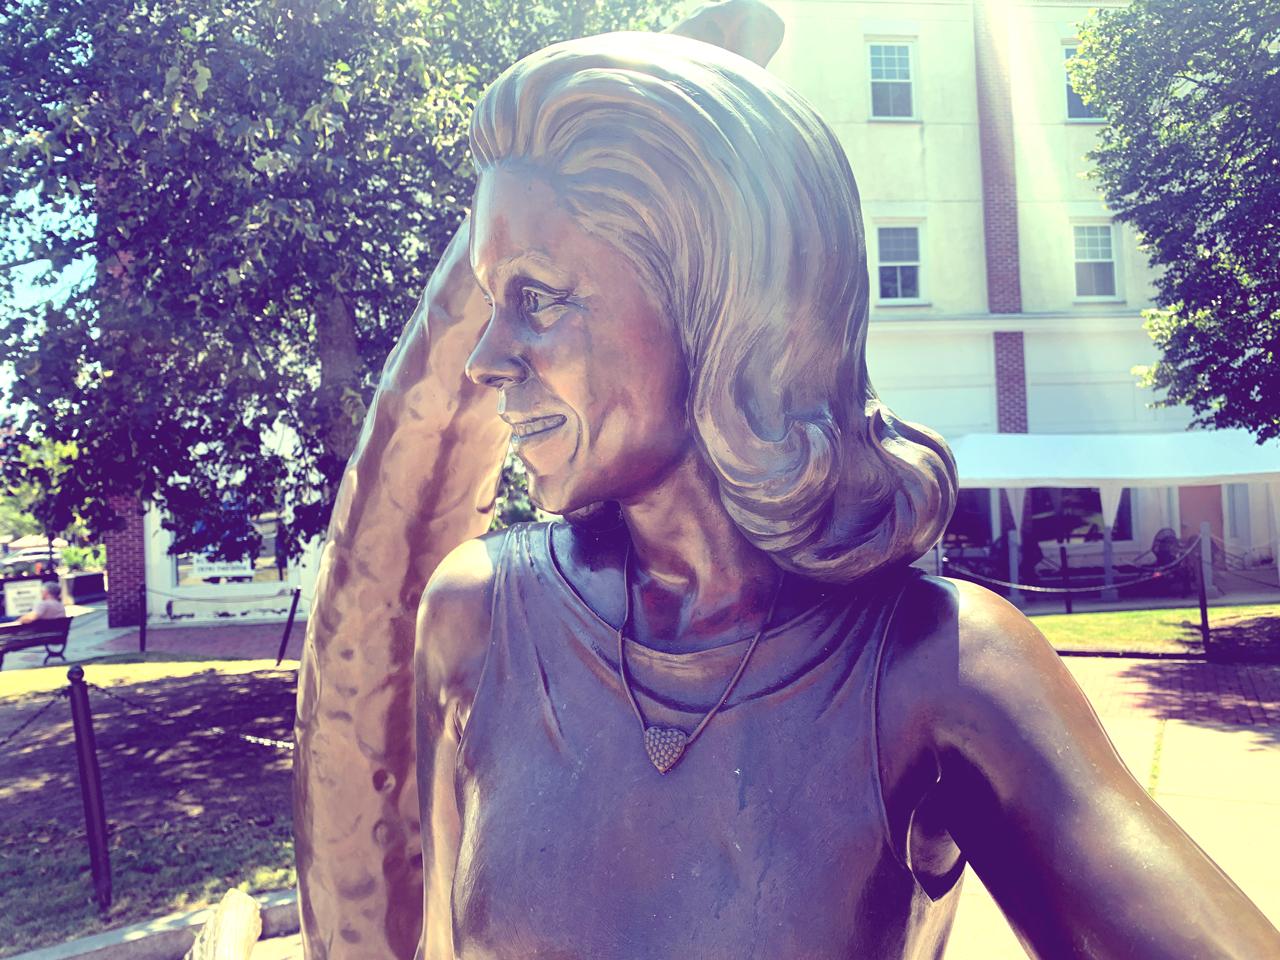 bewitched-statue-salem-massachusetts-1280x960-02